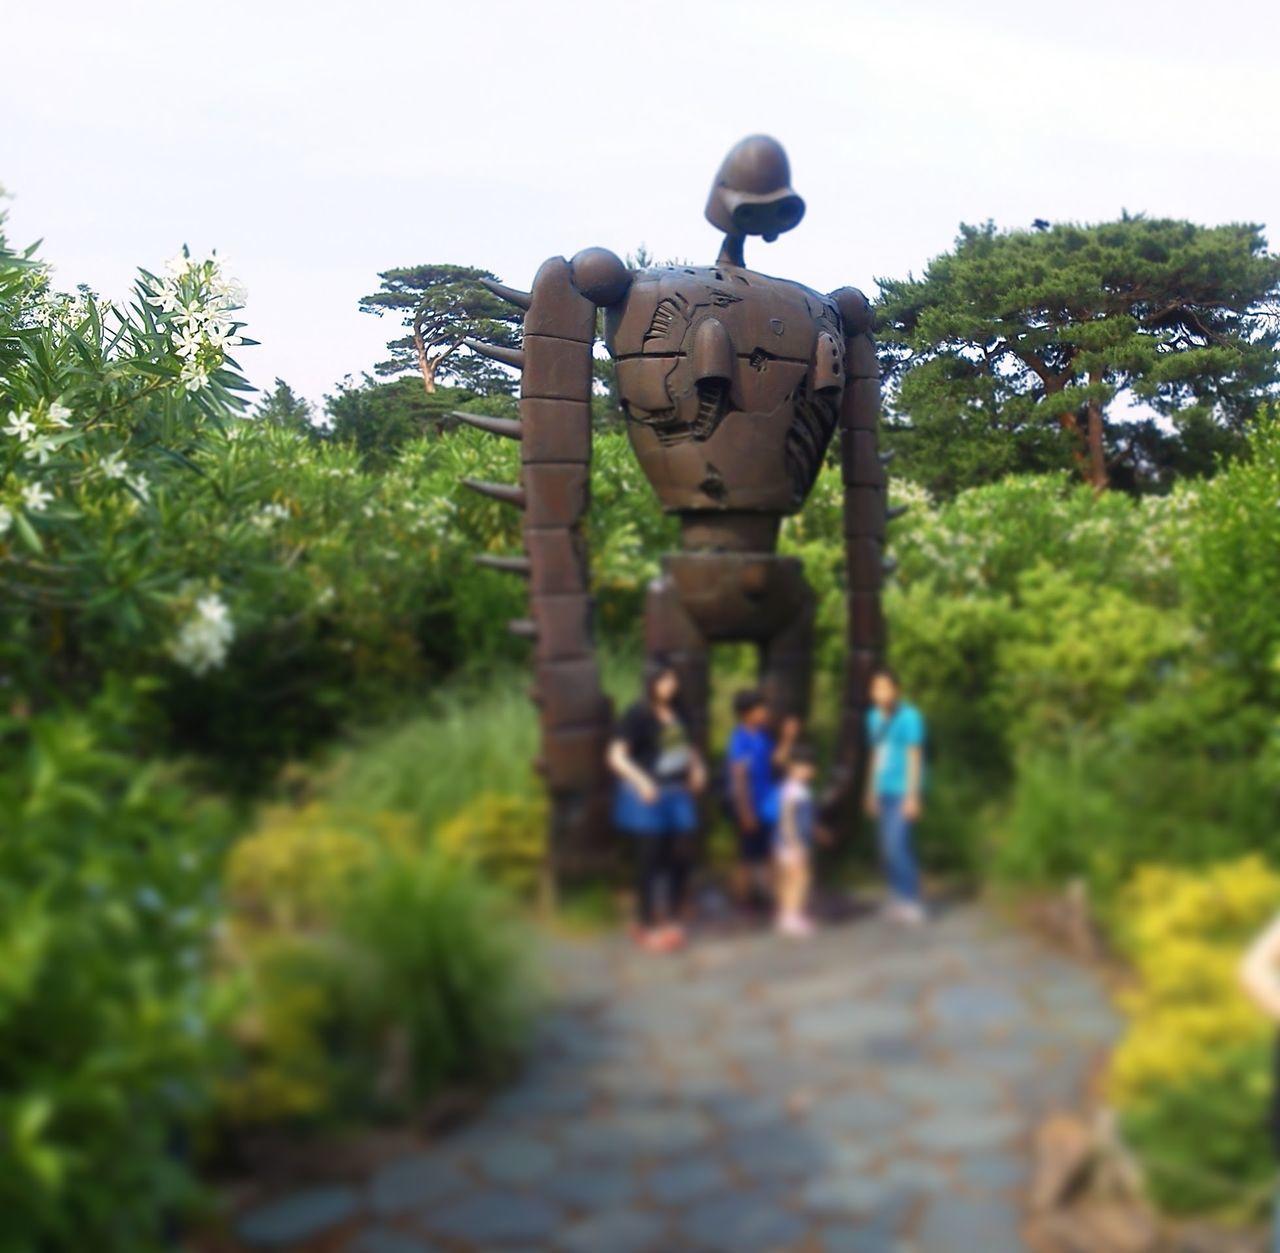 Ultimate Japan ジブリ ジブリ美術館 ジブリの森美術館 Ghibli Ghiblimuseum Ghibli Museum ラピュタ Rapyuta 巨神兵